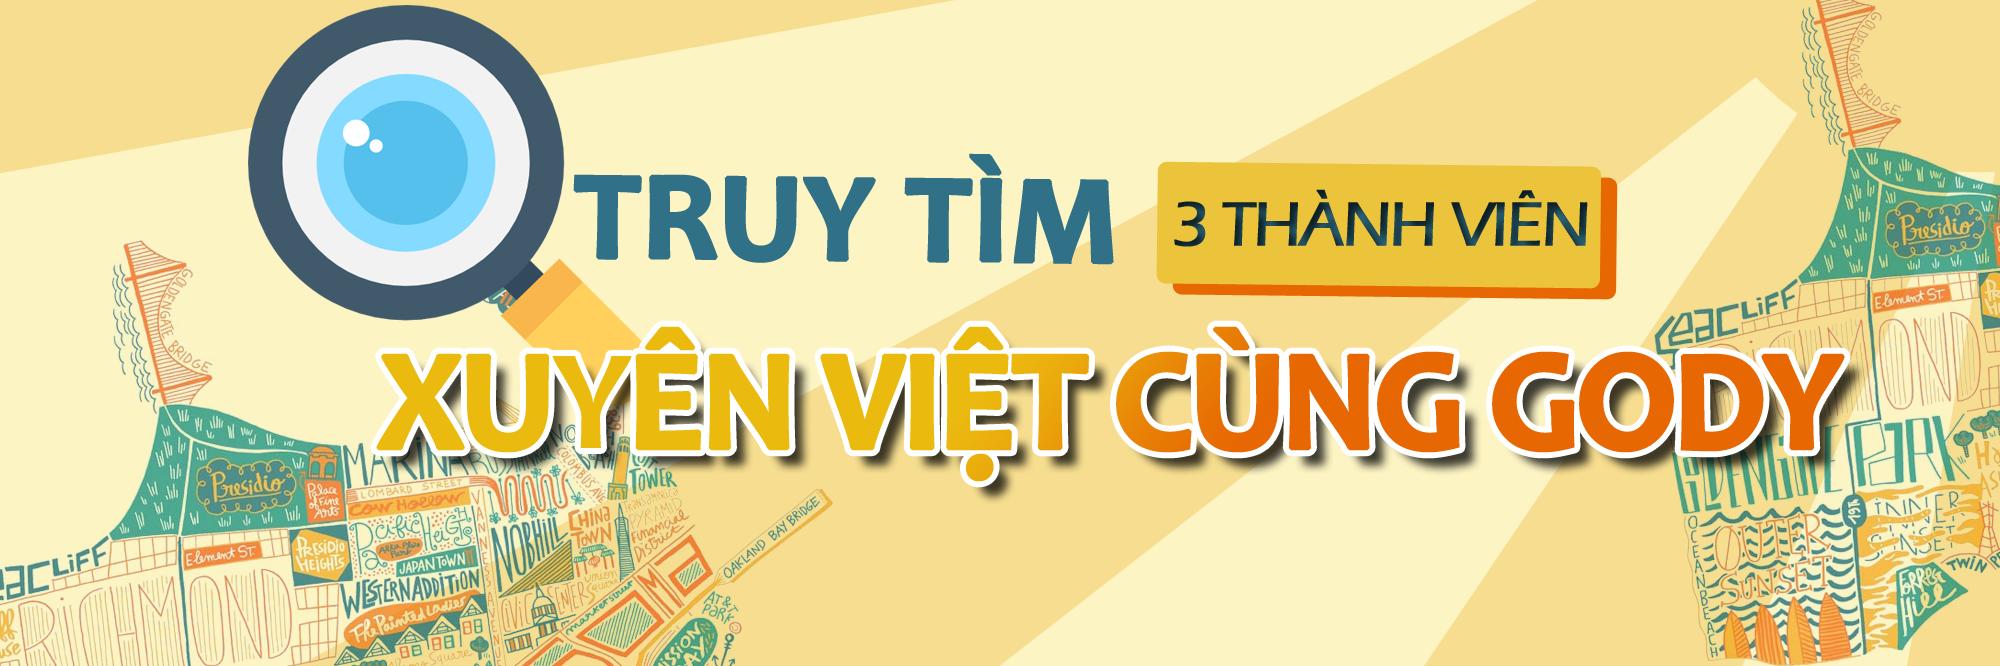 https://gody.vn/blog/nguyentoan05/post/truy-tim-3-thanh-vien-xuyen-viet-cung-gody-2020-3229